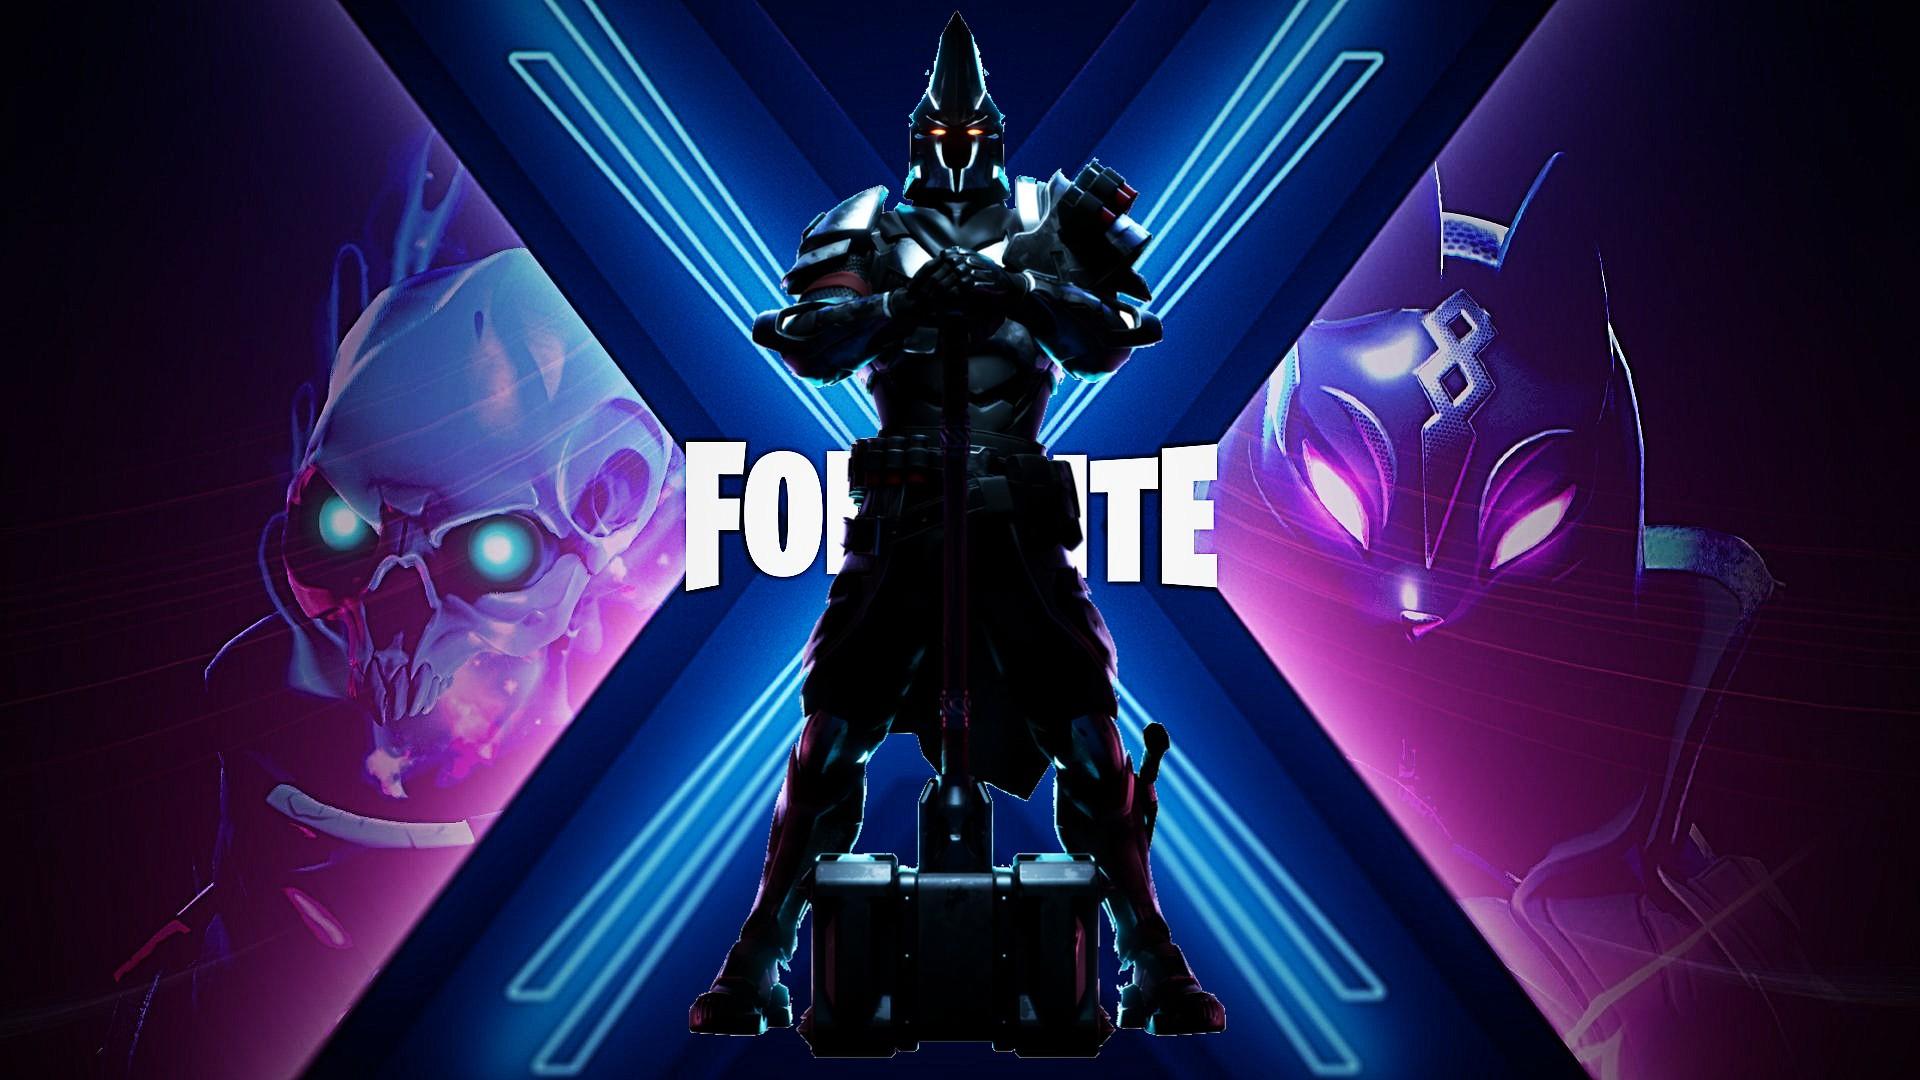 Fortnite Ultima Knight Wallpaper